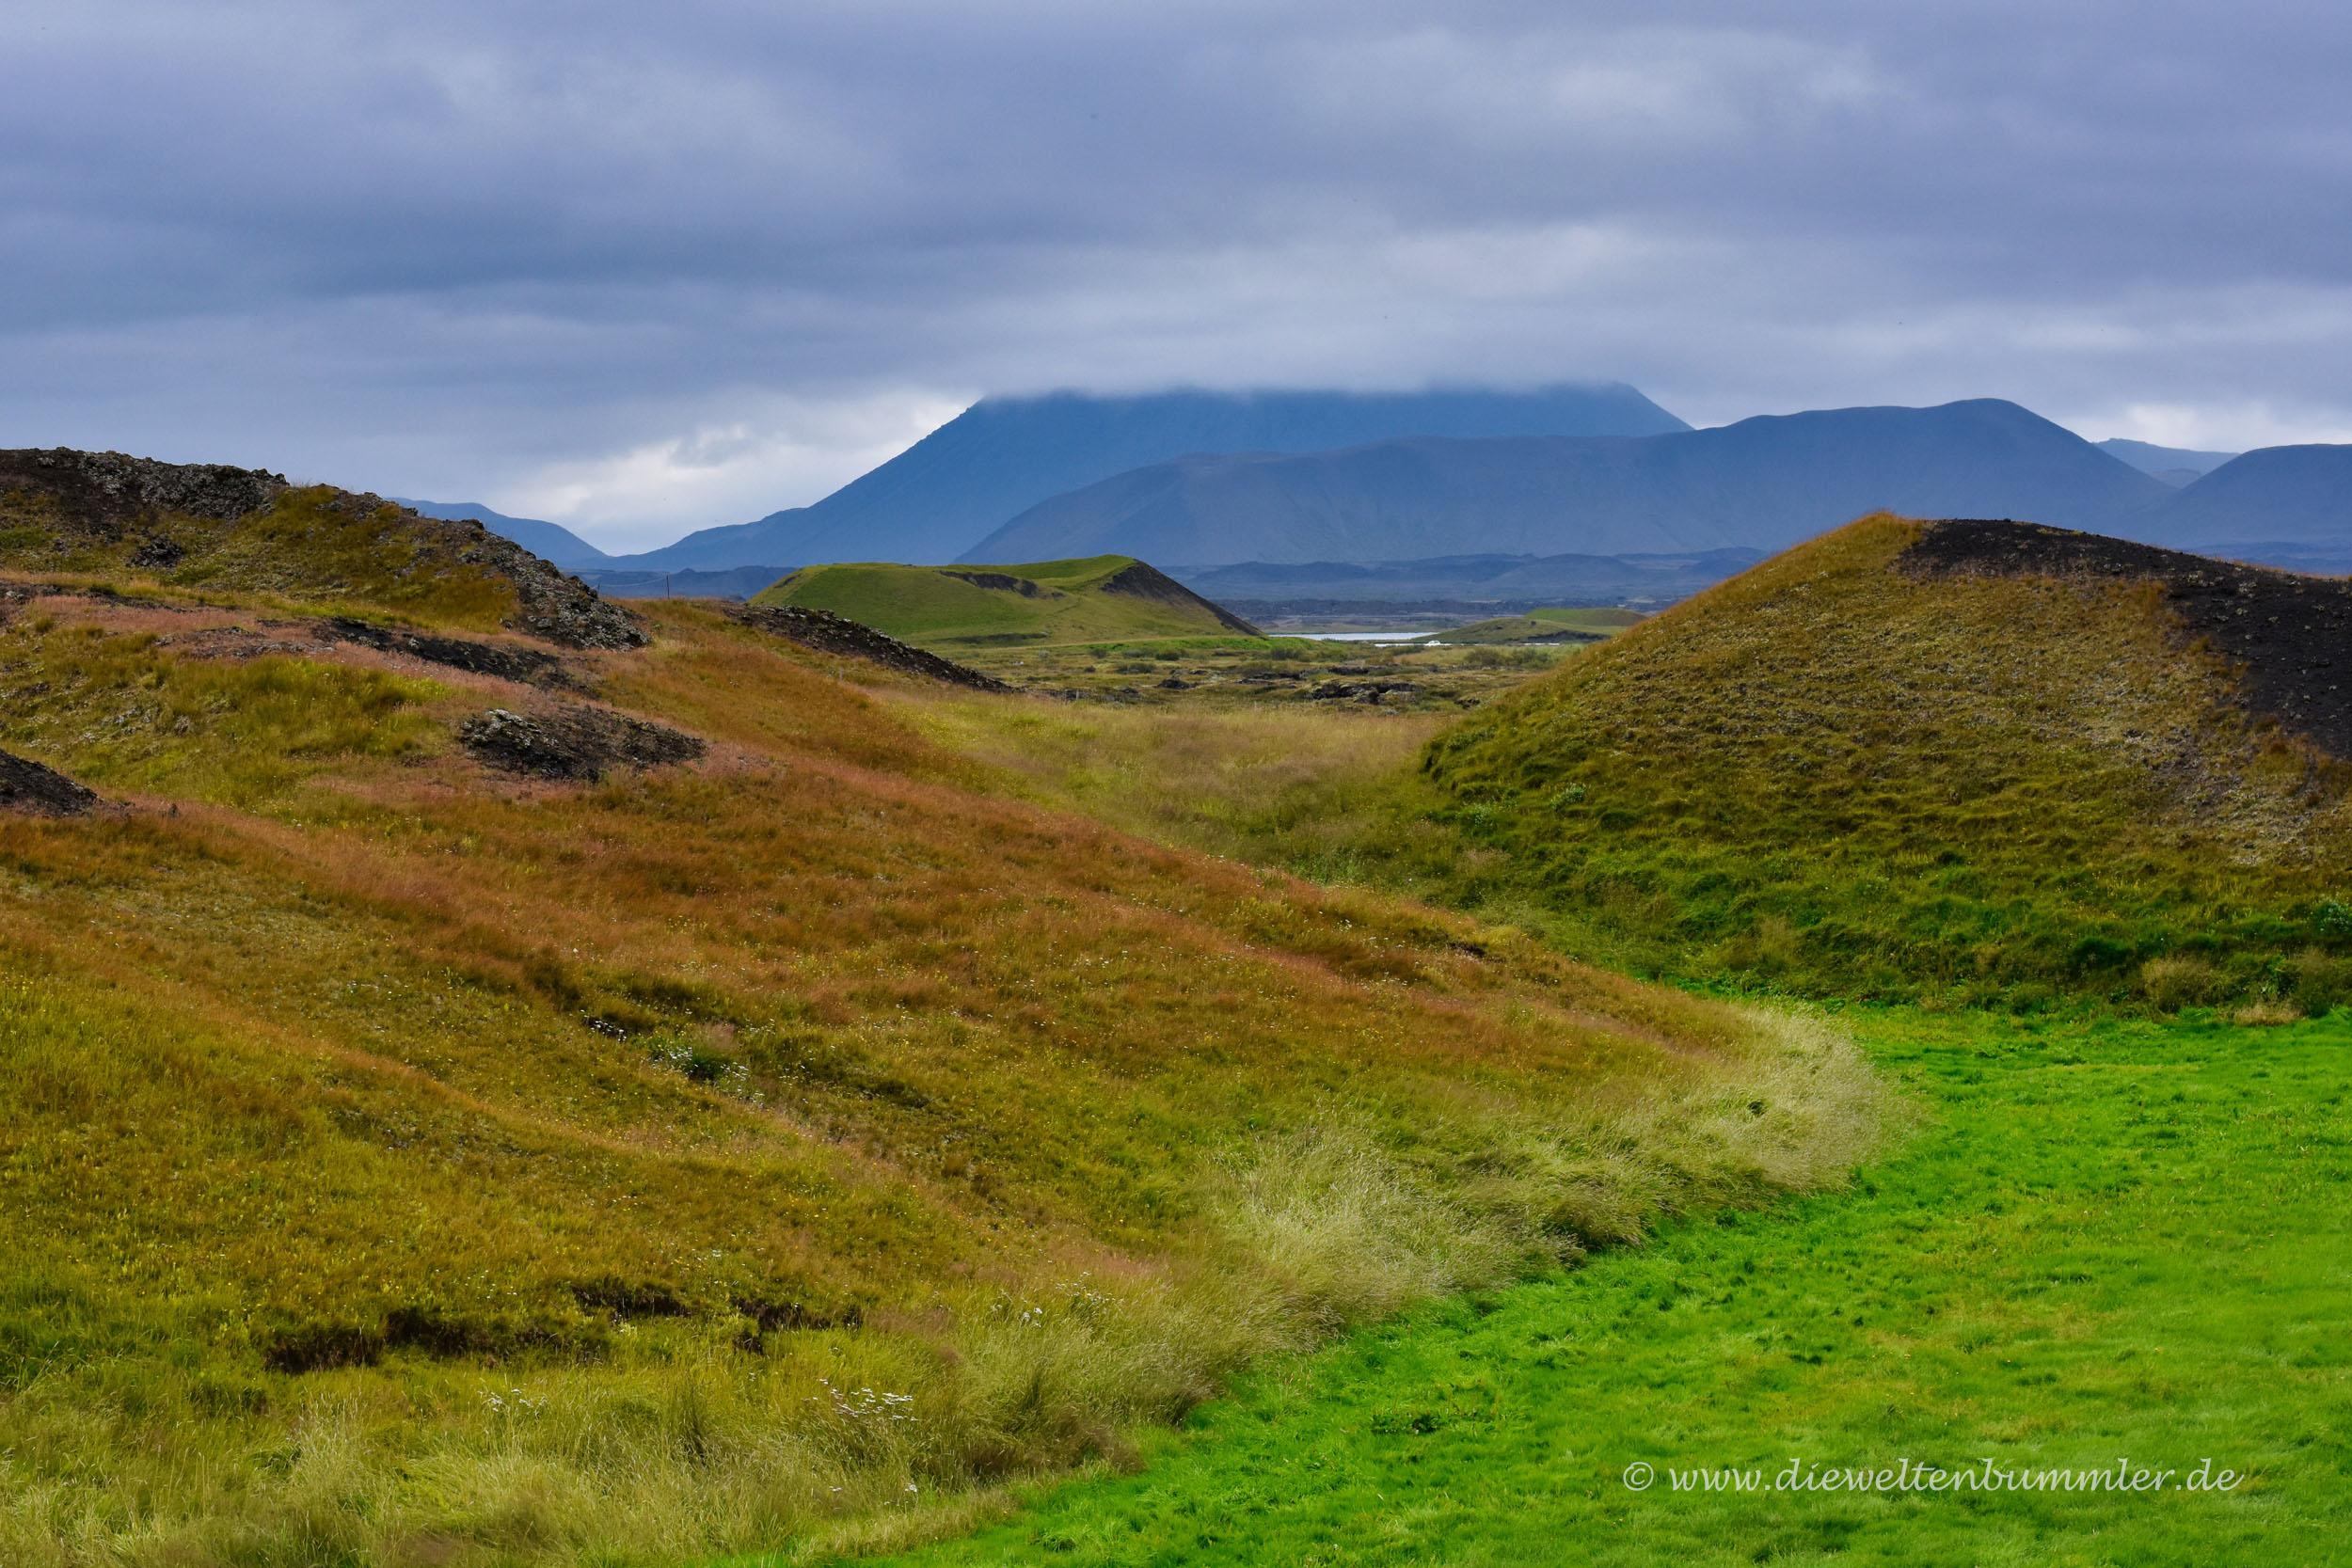 Vulkanlandschaft auf Island